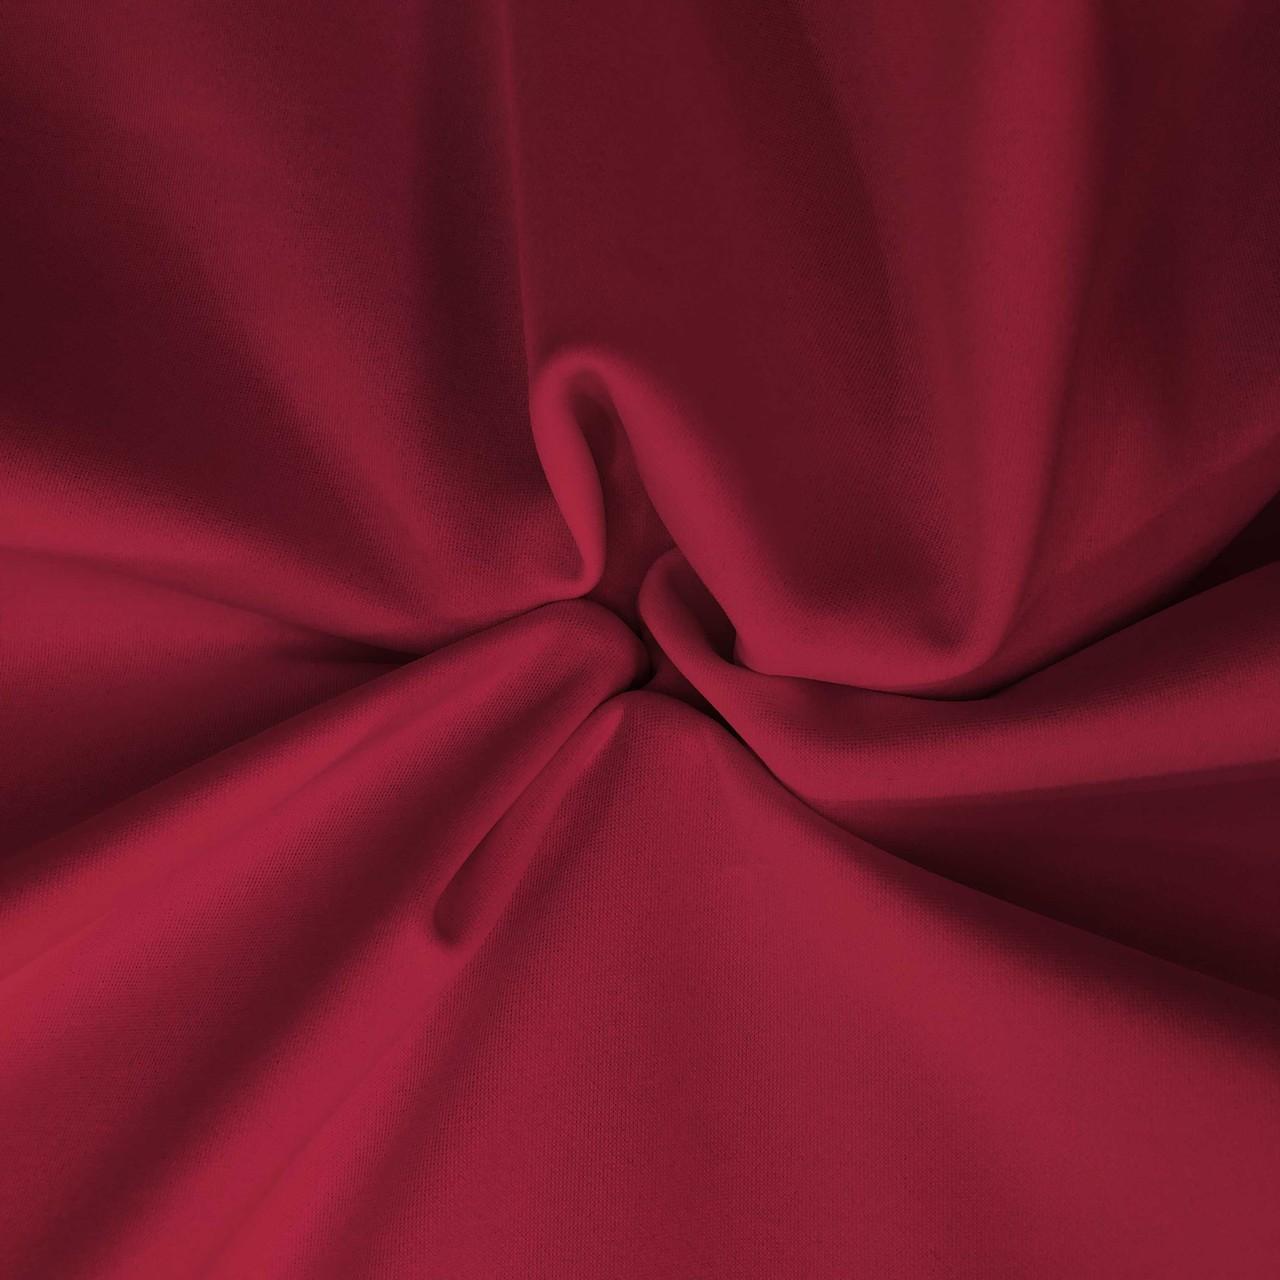 Tecido Malha Neocrepe Liso 97%Poliéster 3%Elastano Vermelho